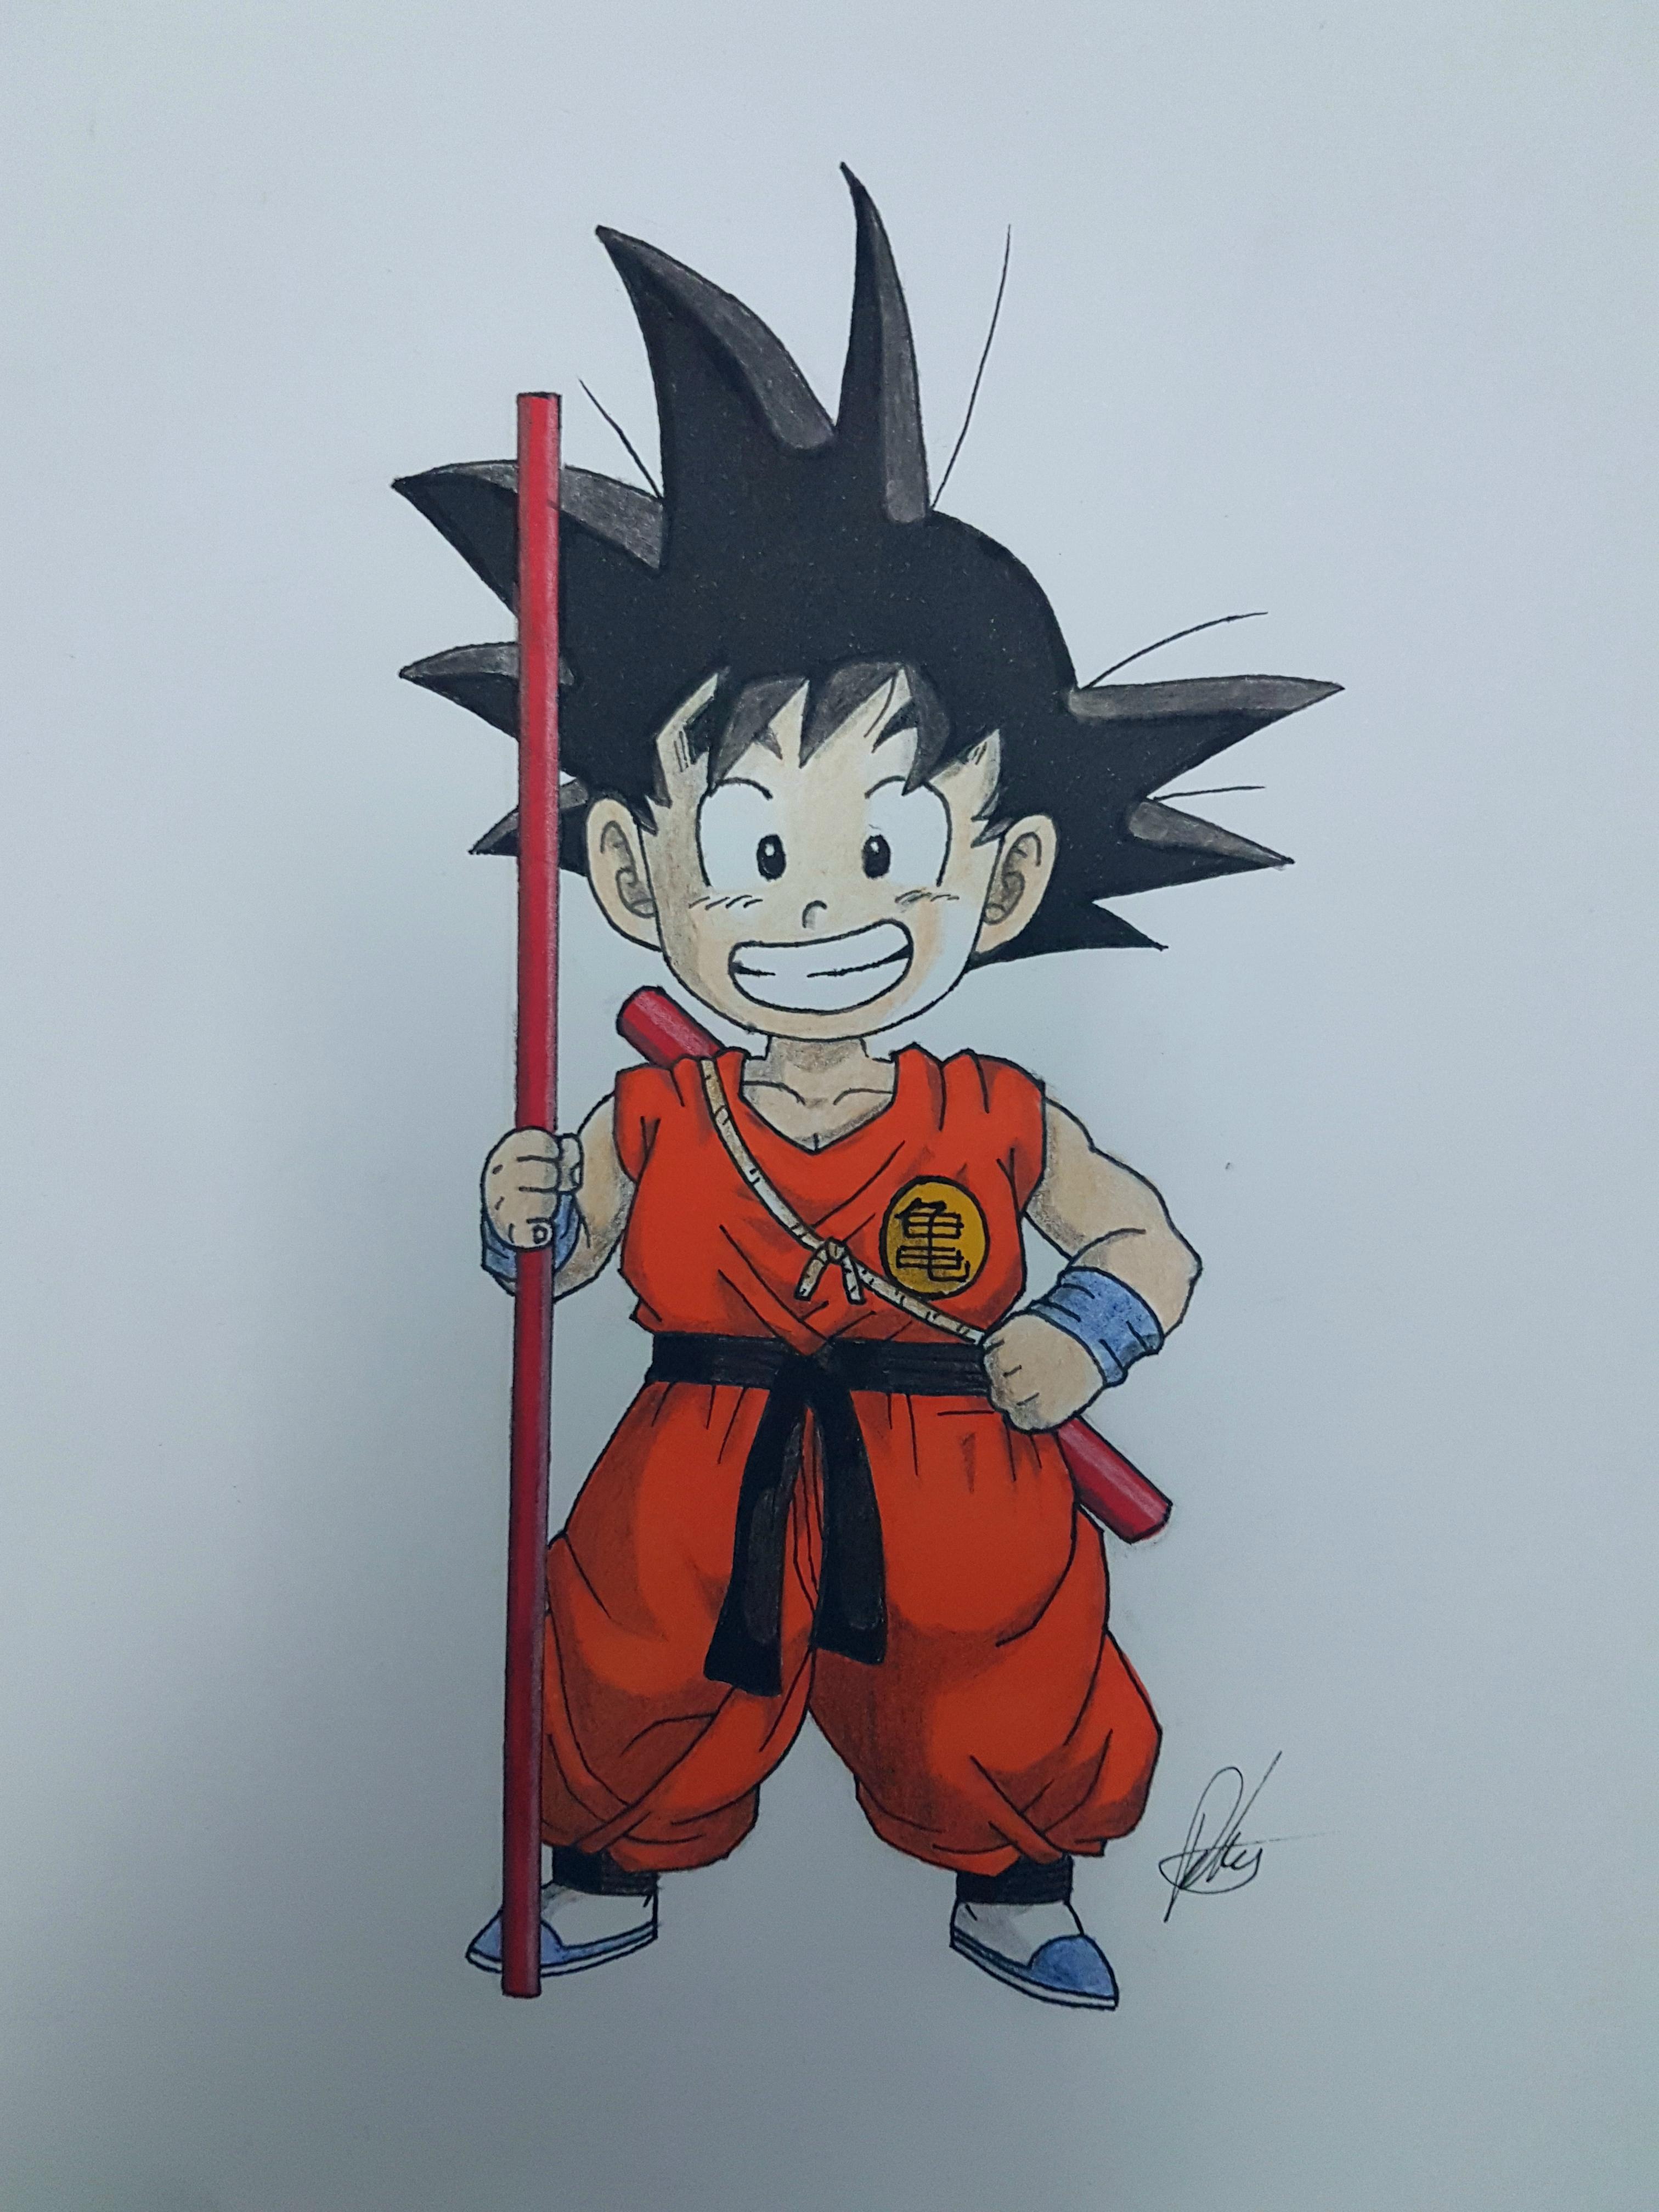 3024x4032 Oc] Kid Goku Drawing Dbz